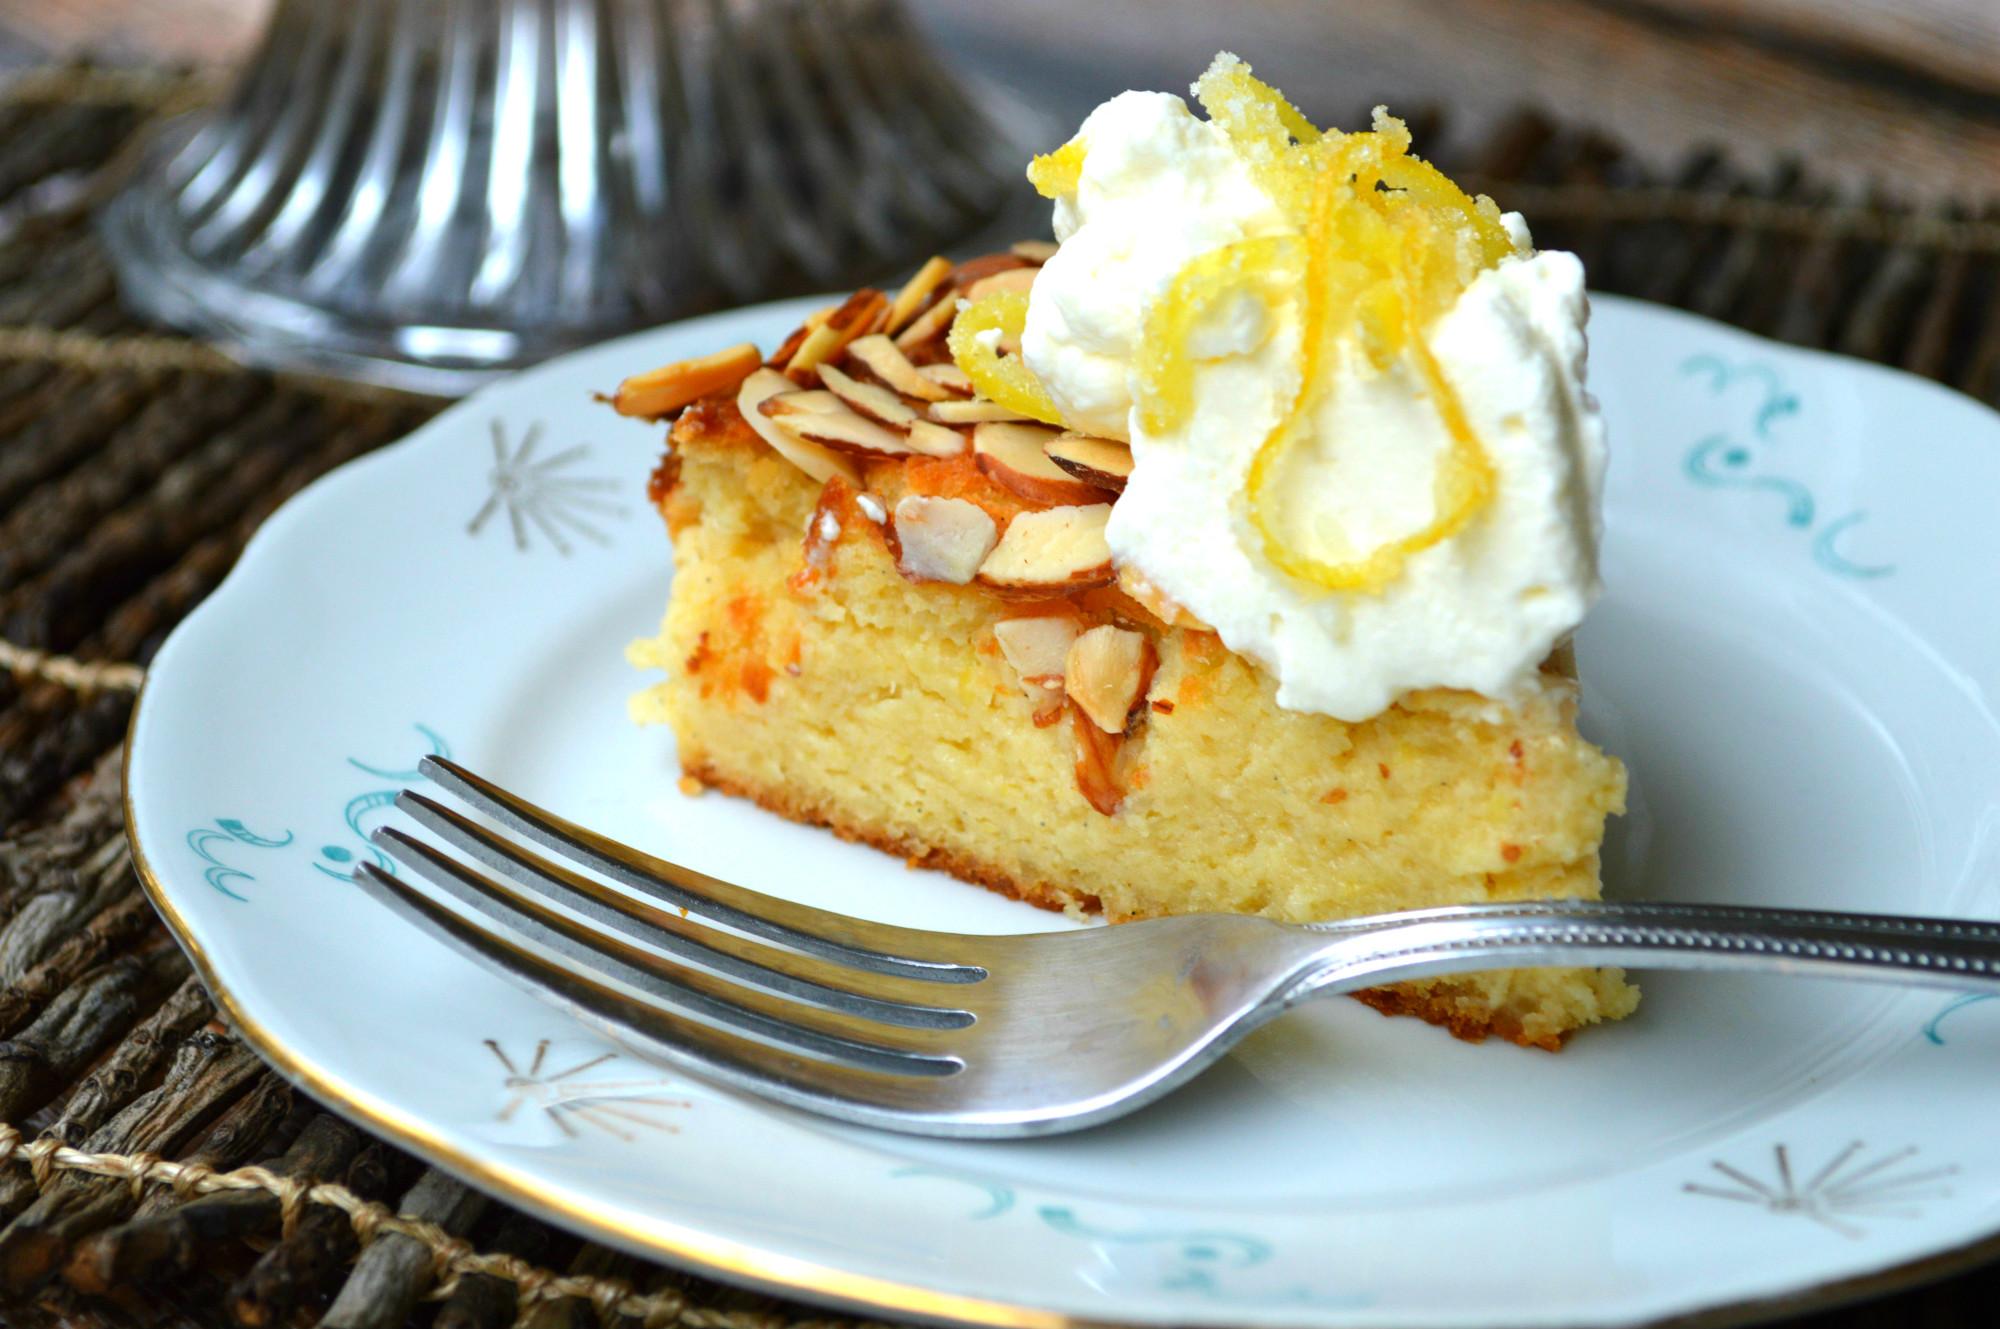 Watch Lemon Ricotta Cheesecake video